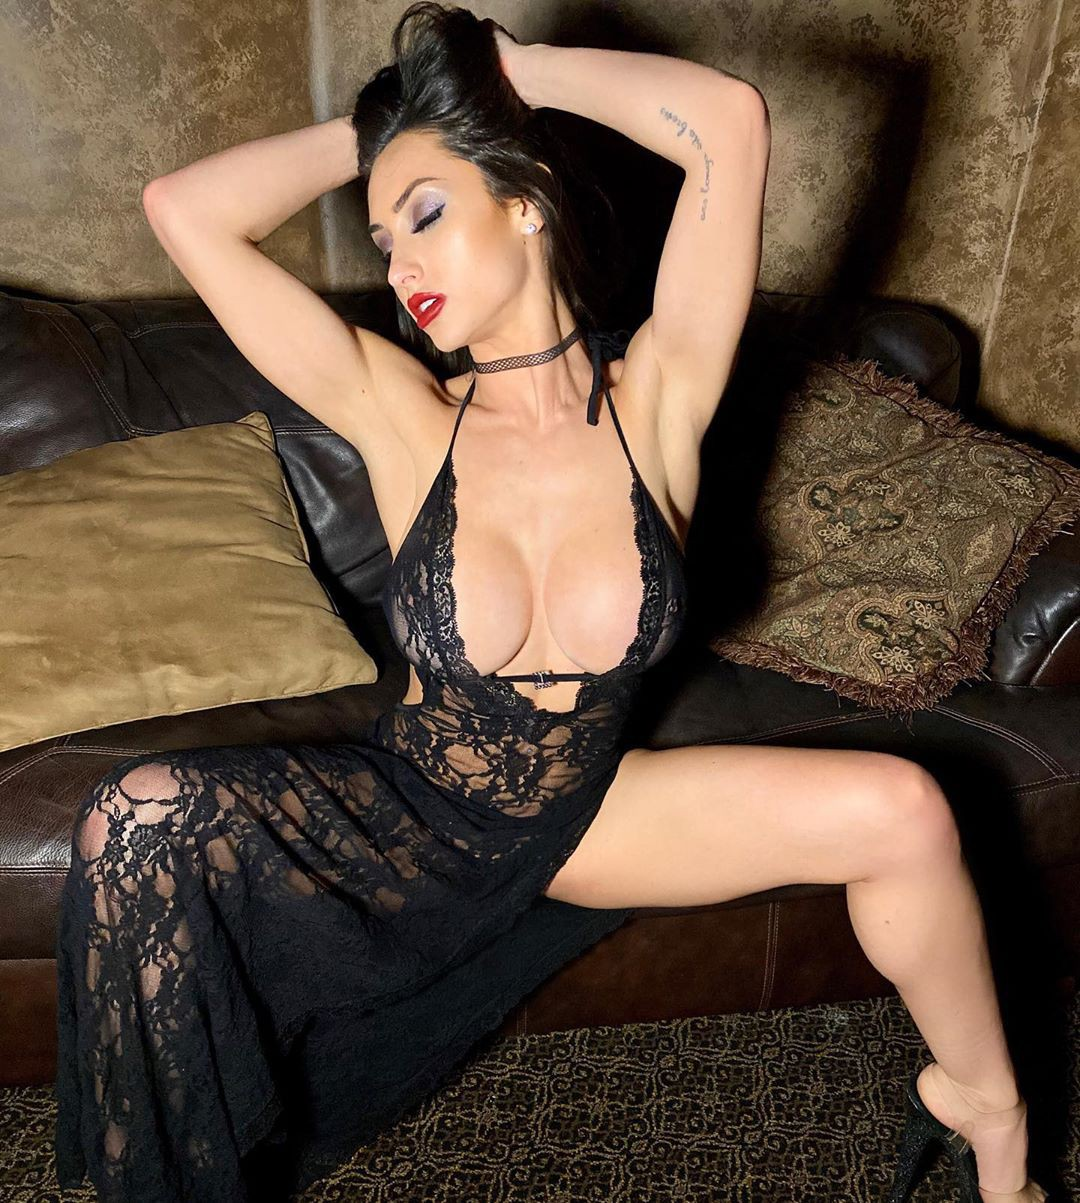 Reya Sunshine fetish model matching style, best photoshoot ideas, woman thighs